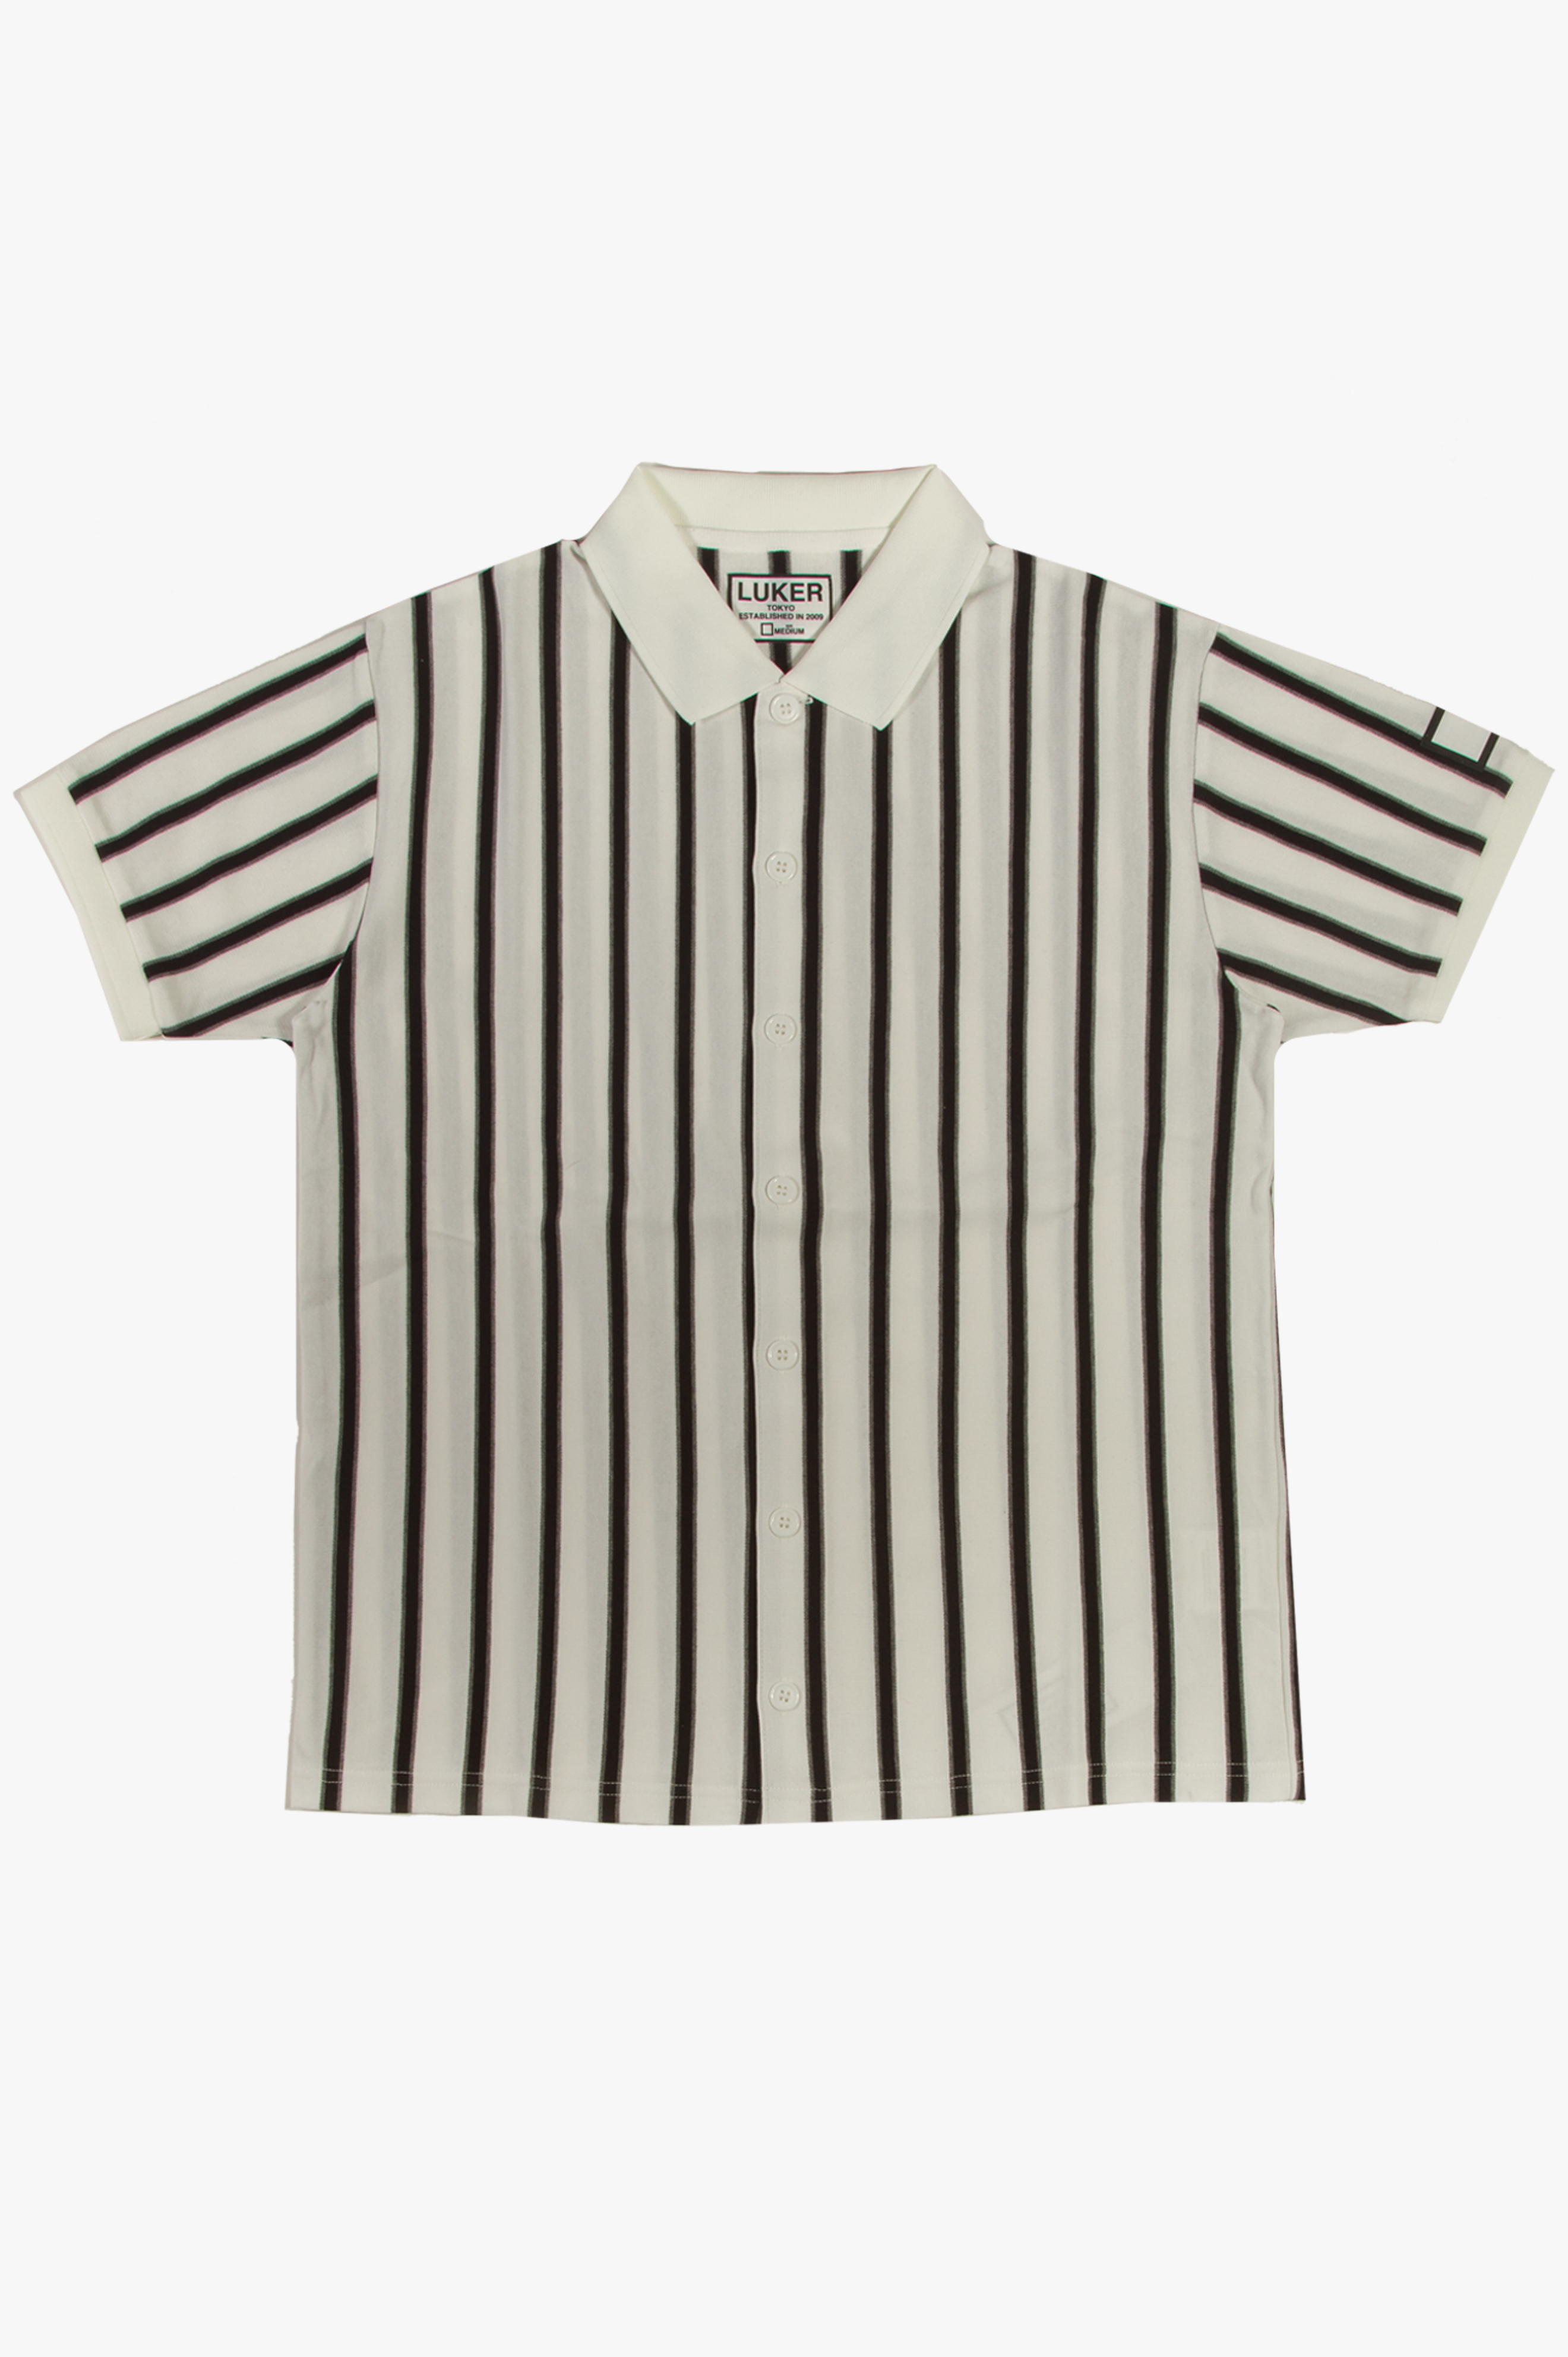 Polo Striped Shirt White/Black